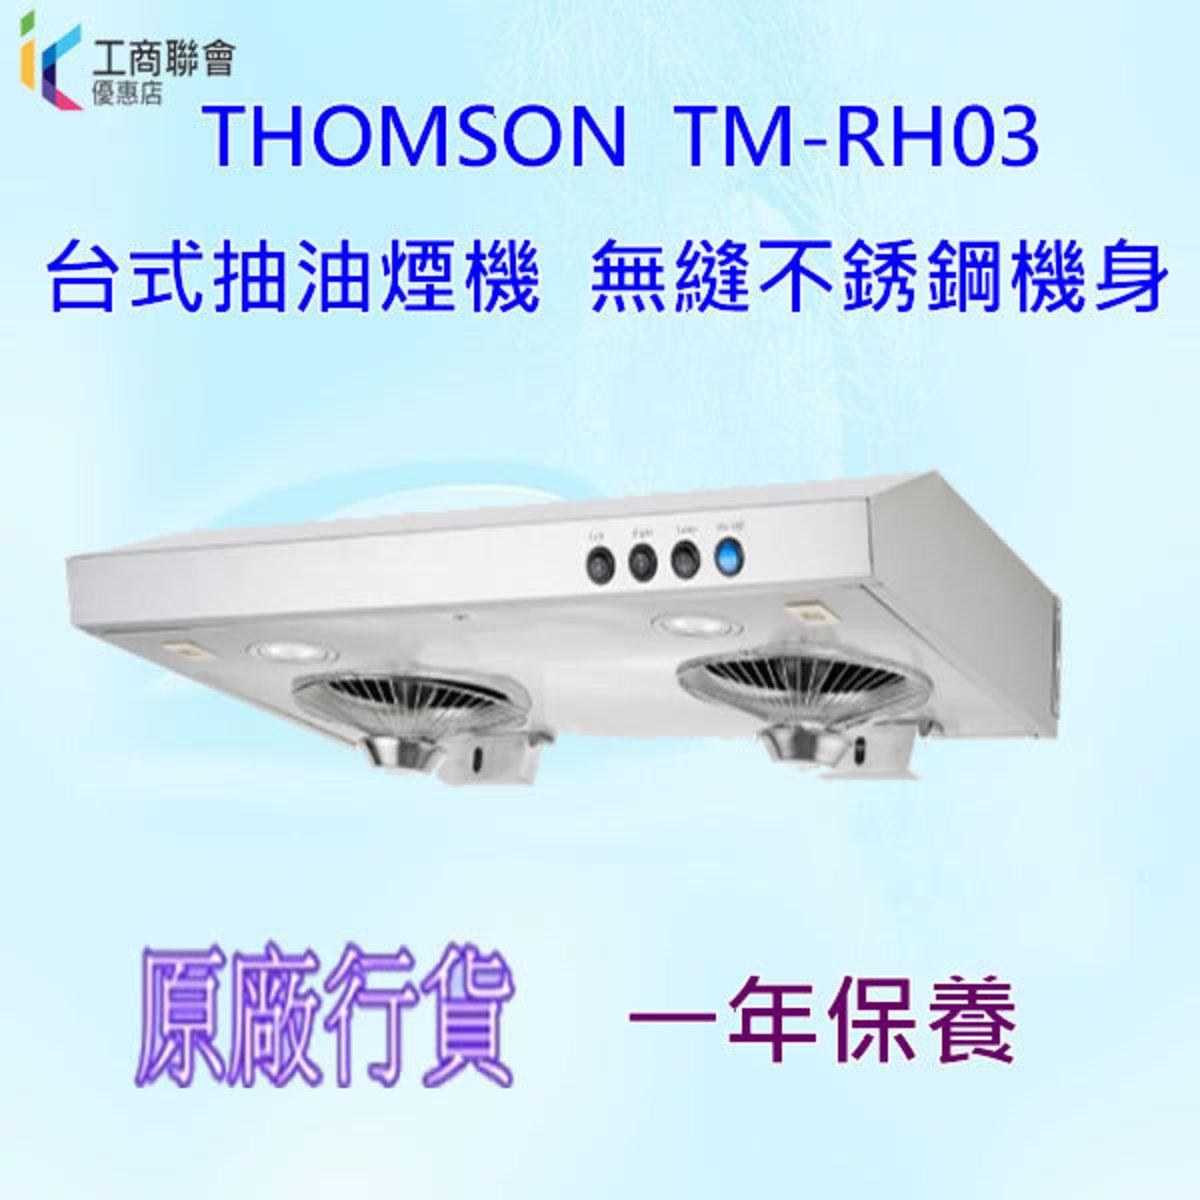 TMRH03 Desktop Range Hood Seamless stainless steel body